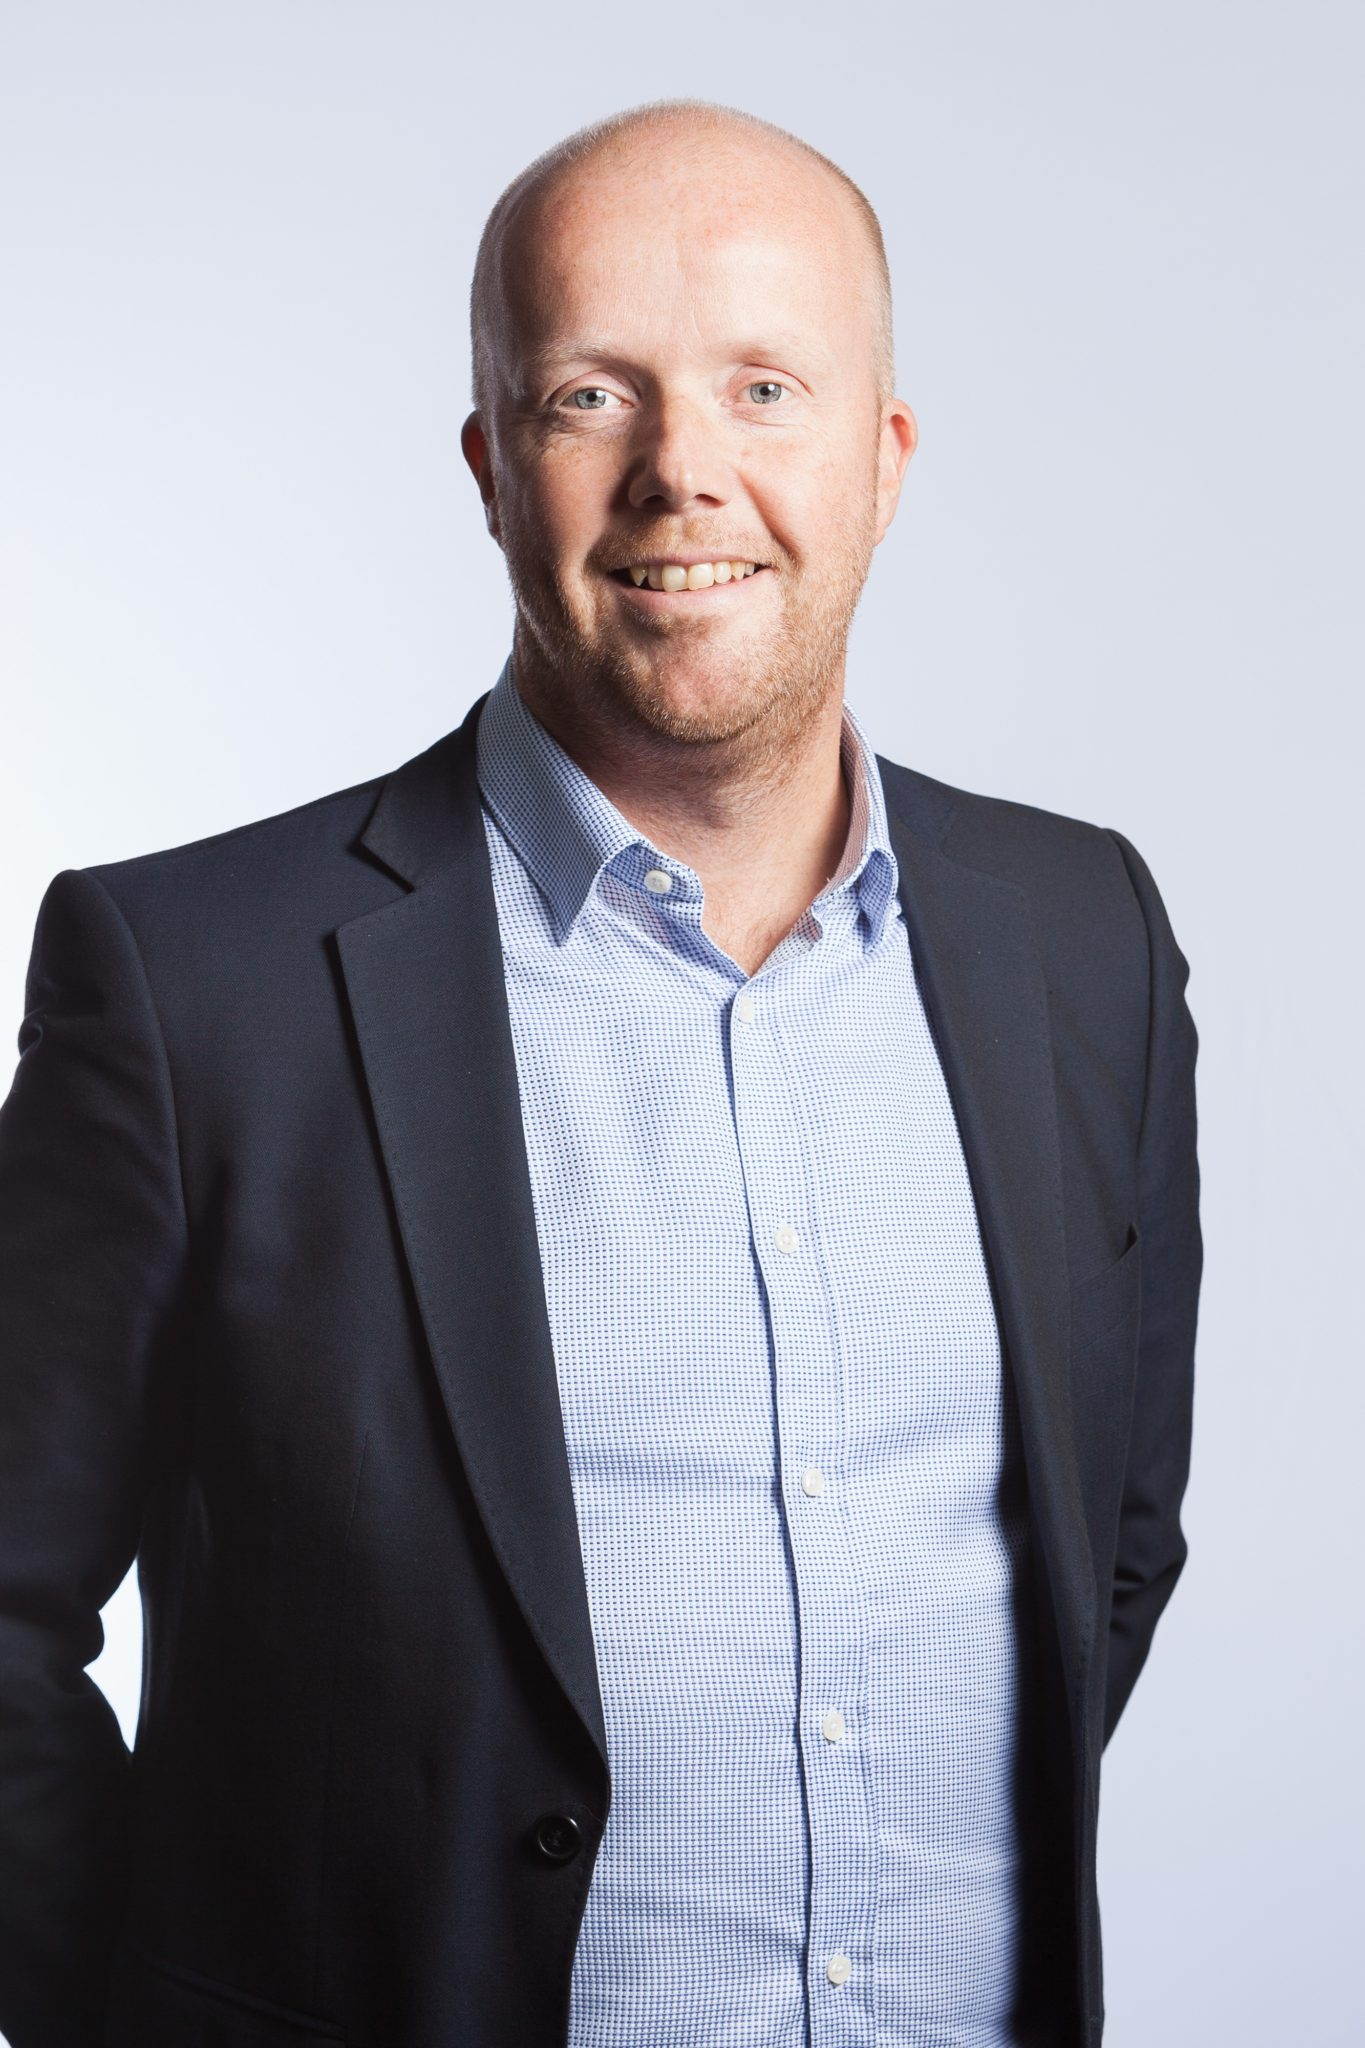 Christer Lund